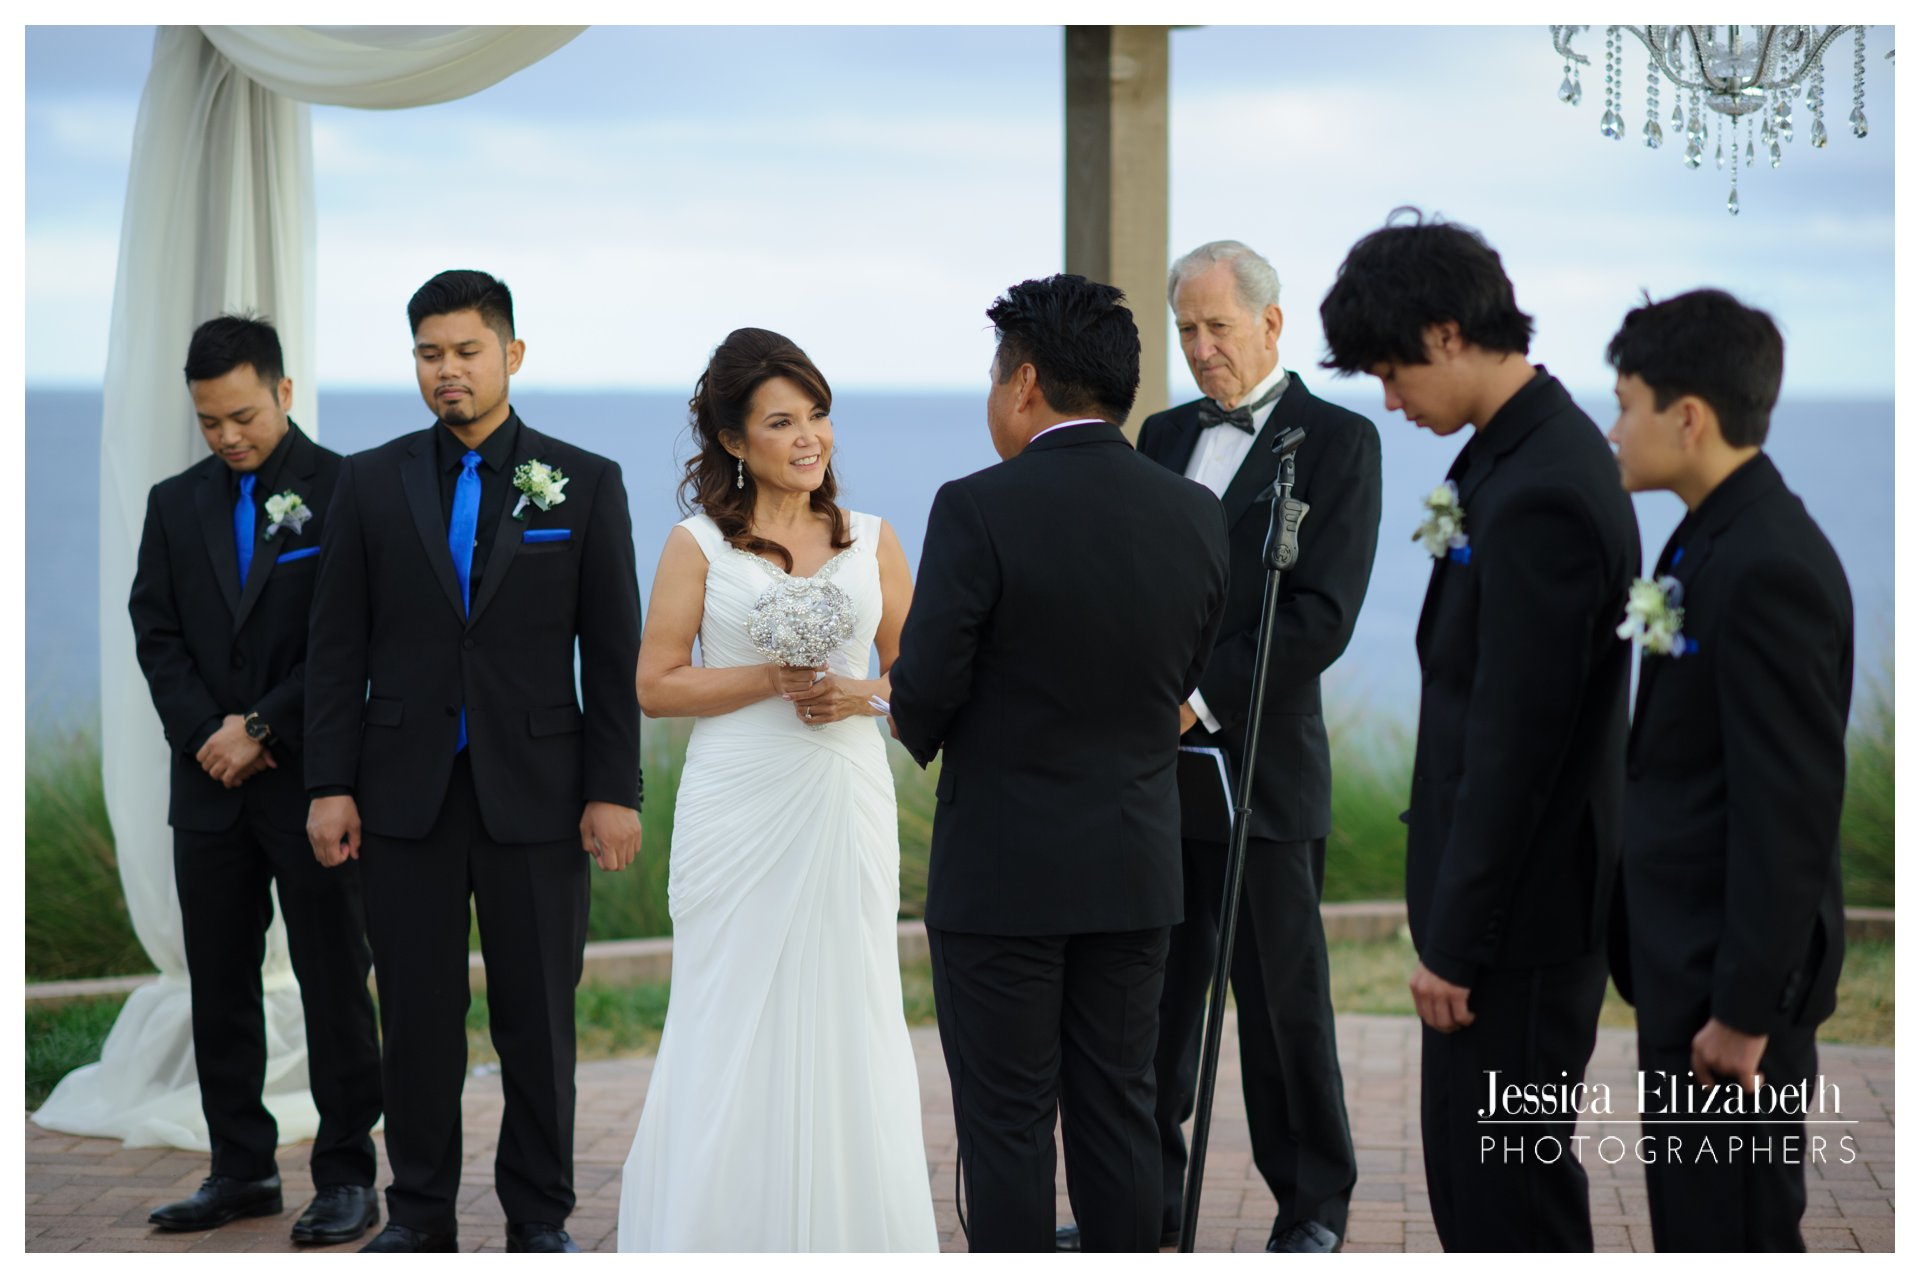 16-Terranea-Palos-Verdes-Wedding-Photography-by-Jessica-Elizabeth-w.jpg